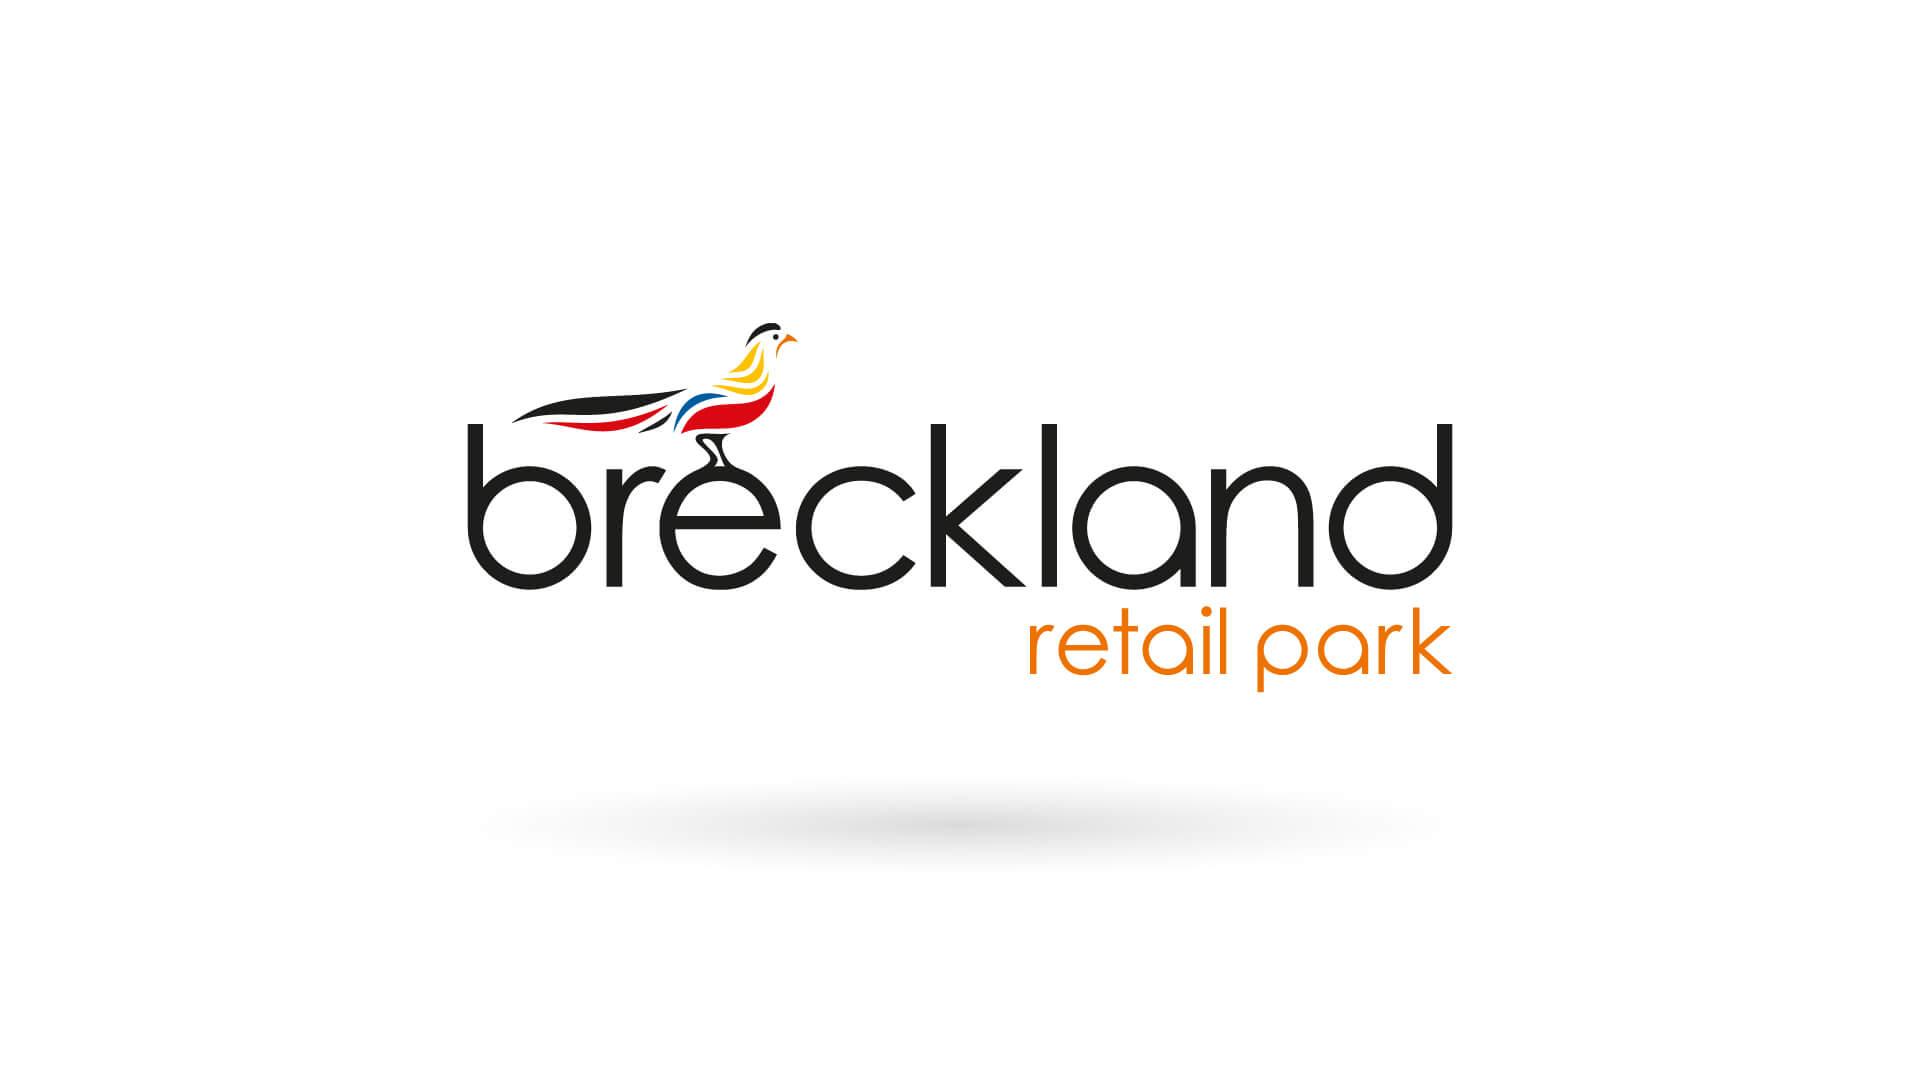 Breckland Retail Park Brand